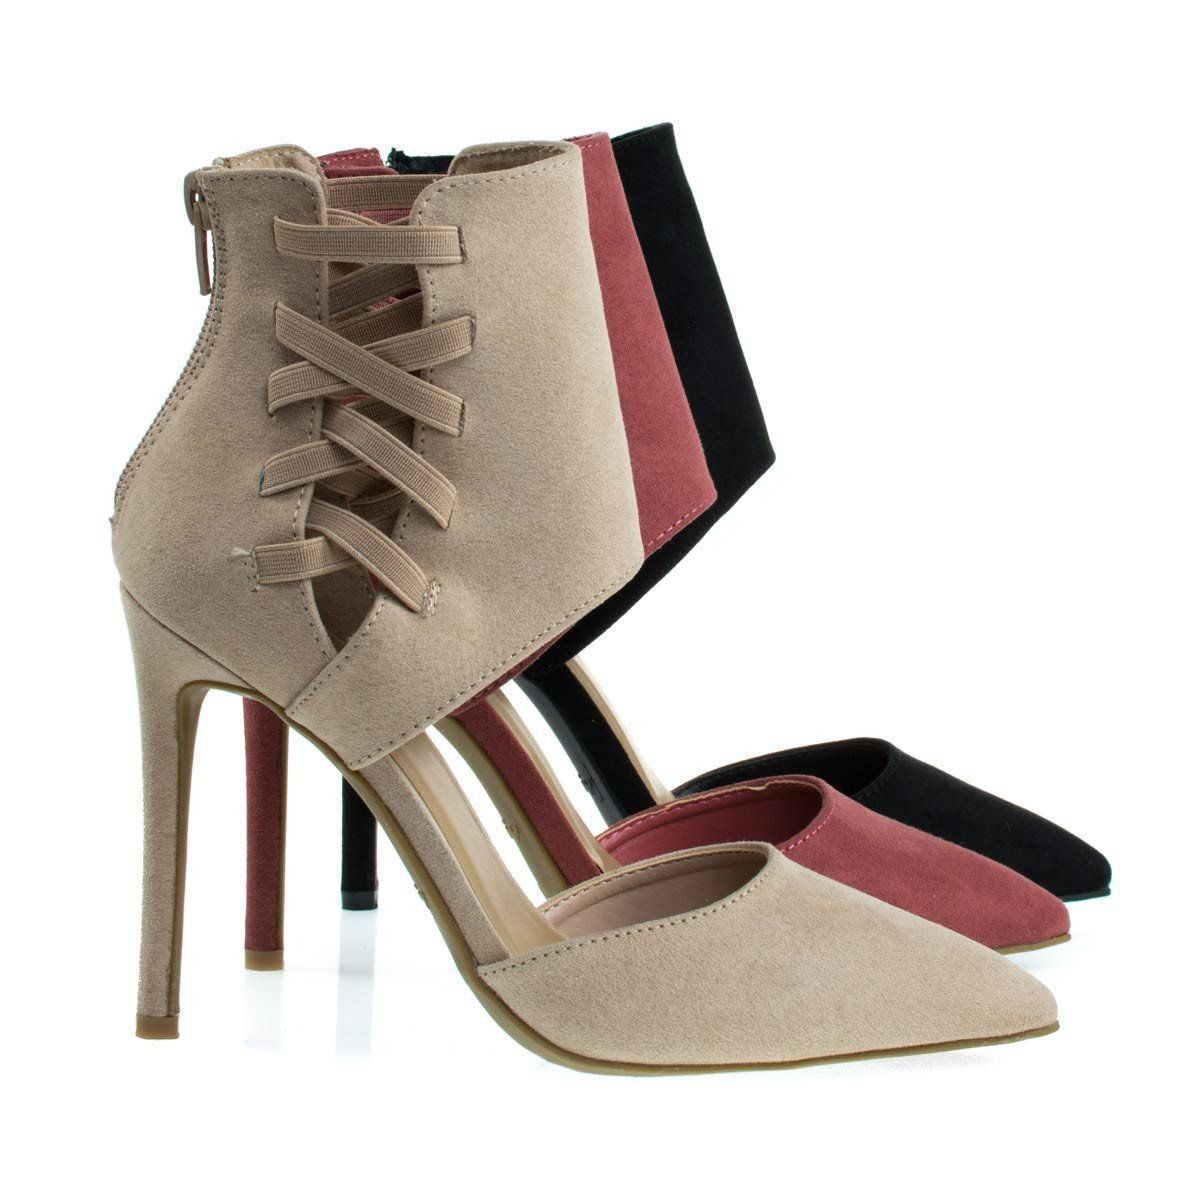 Womens Pointy Toe Pump Ankle High Cuff W Elastic Strap D/'Orsay Cut Worship-37s